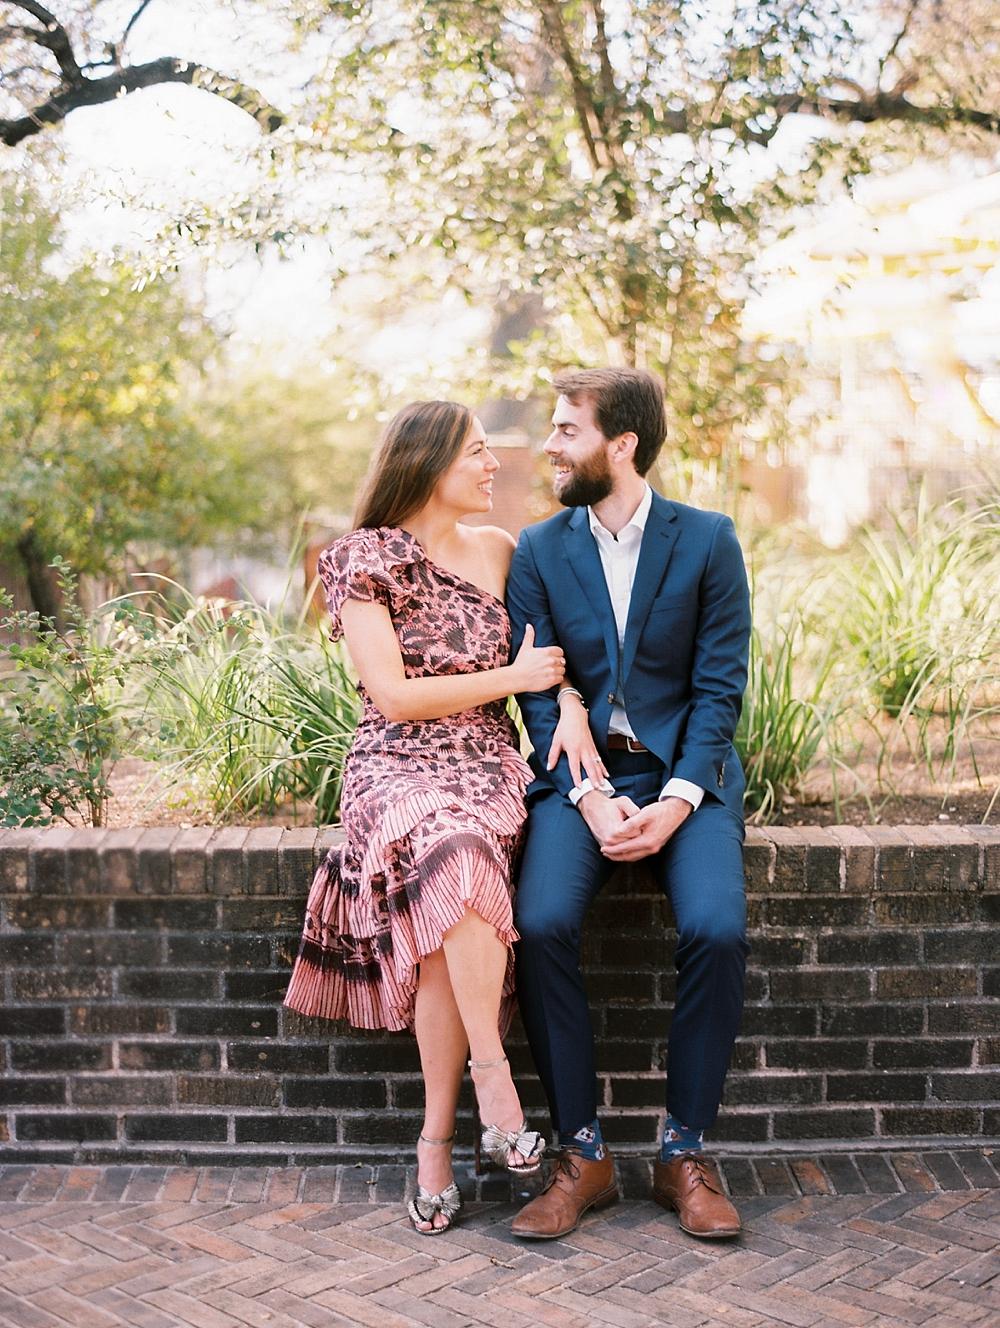 kristin-la-voie-photography-Austin-Wedding-Photographer-laguna-gloria-commodore-perry-estate-engagement-88